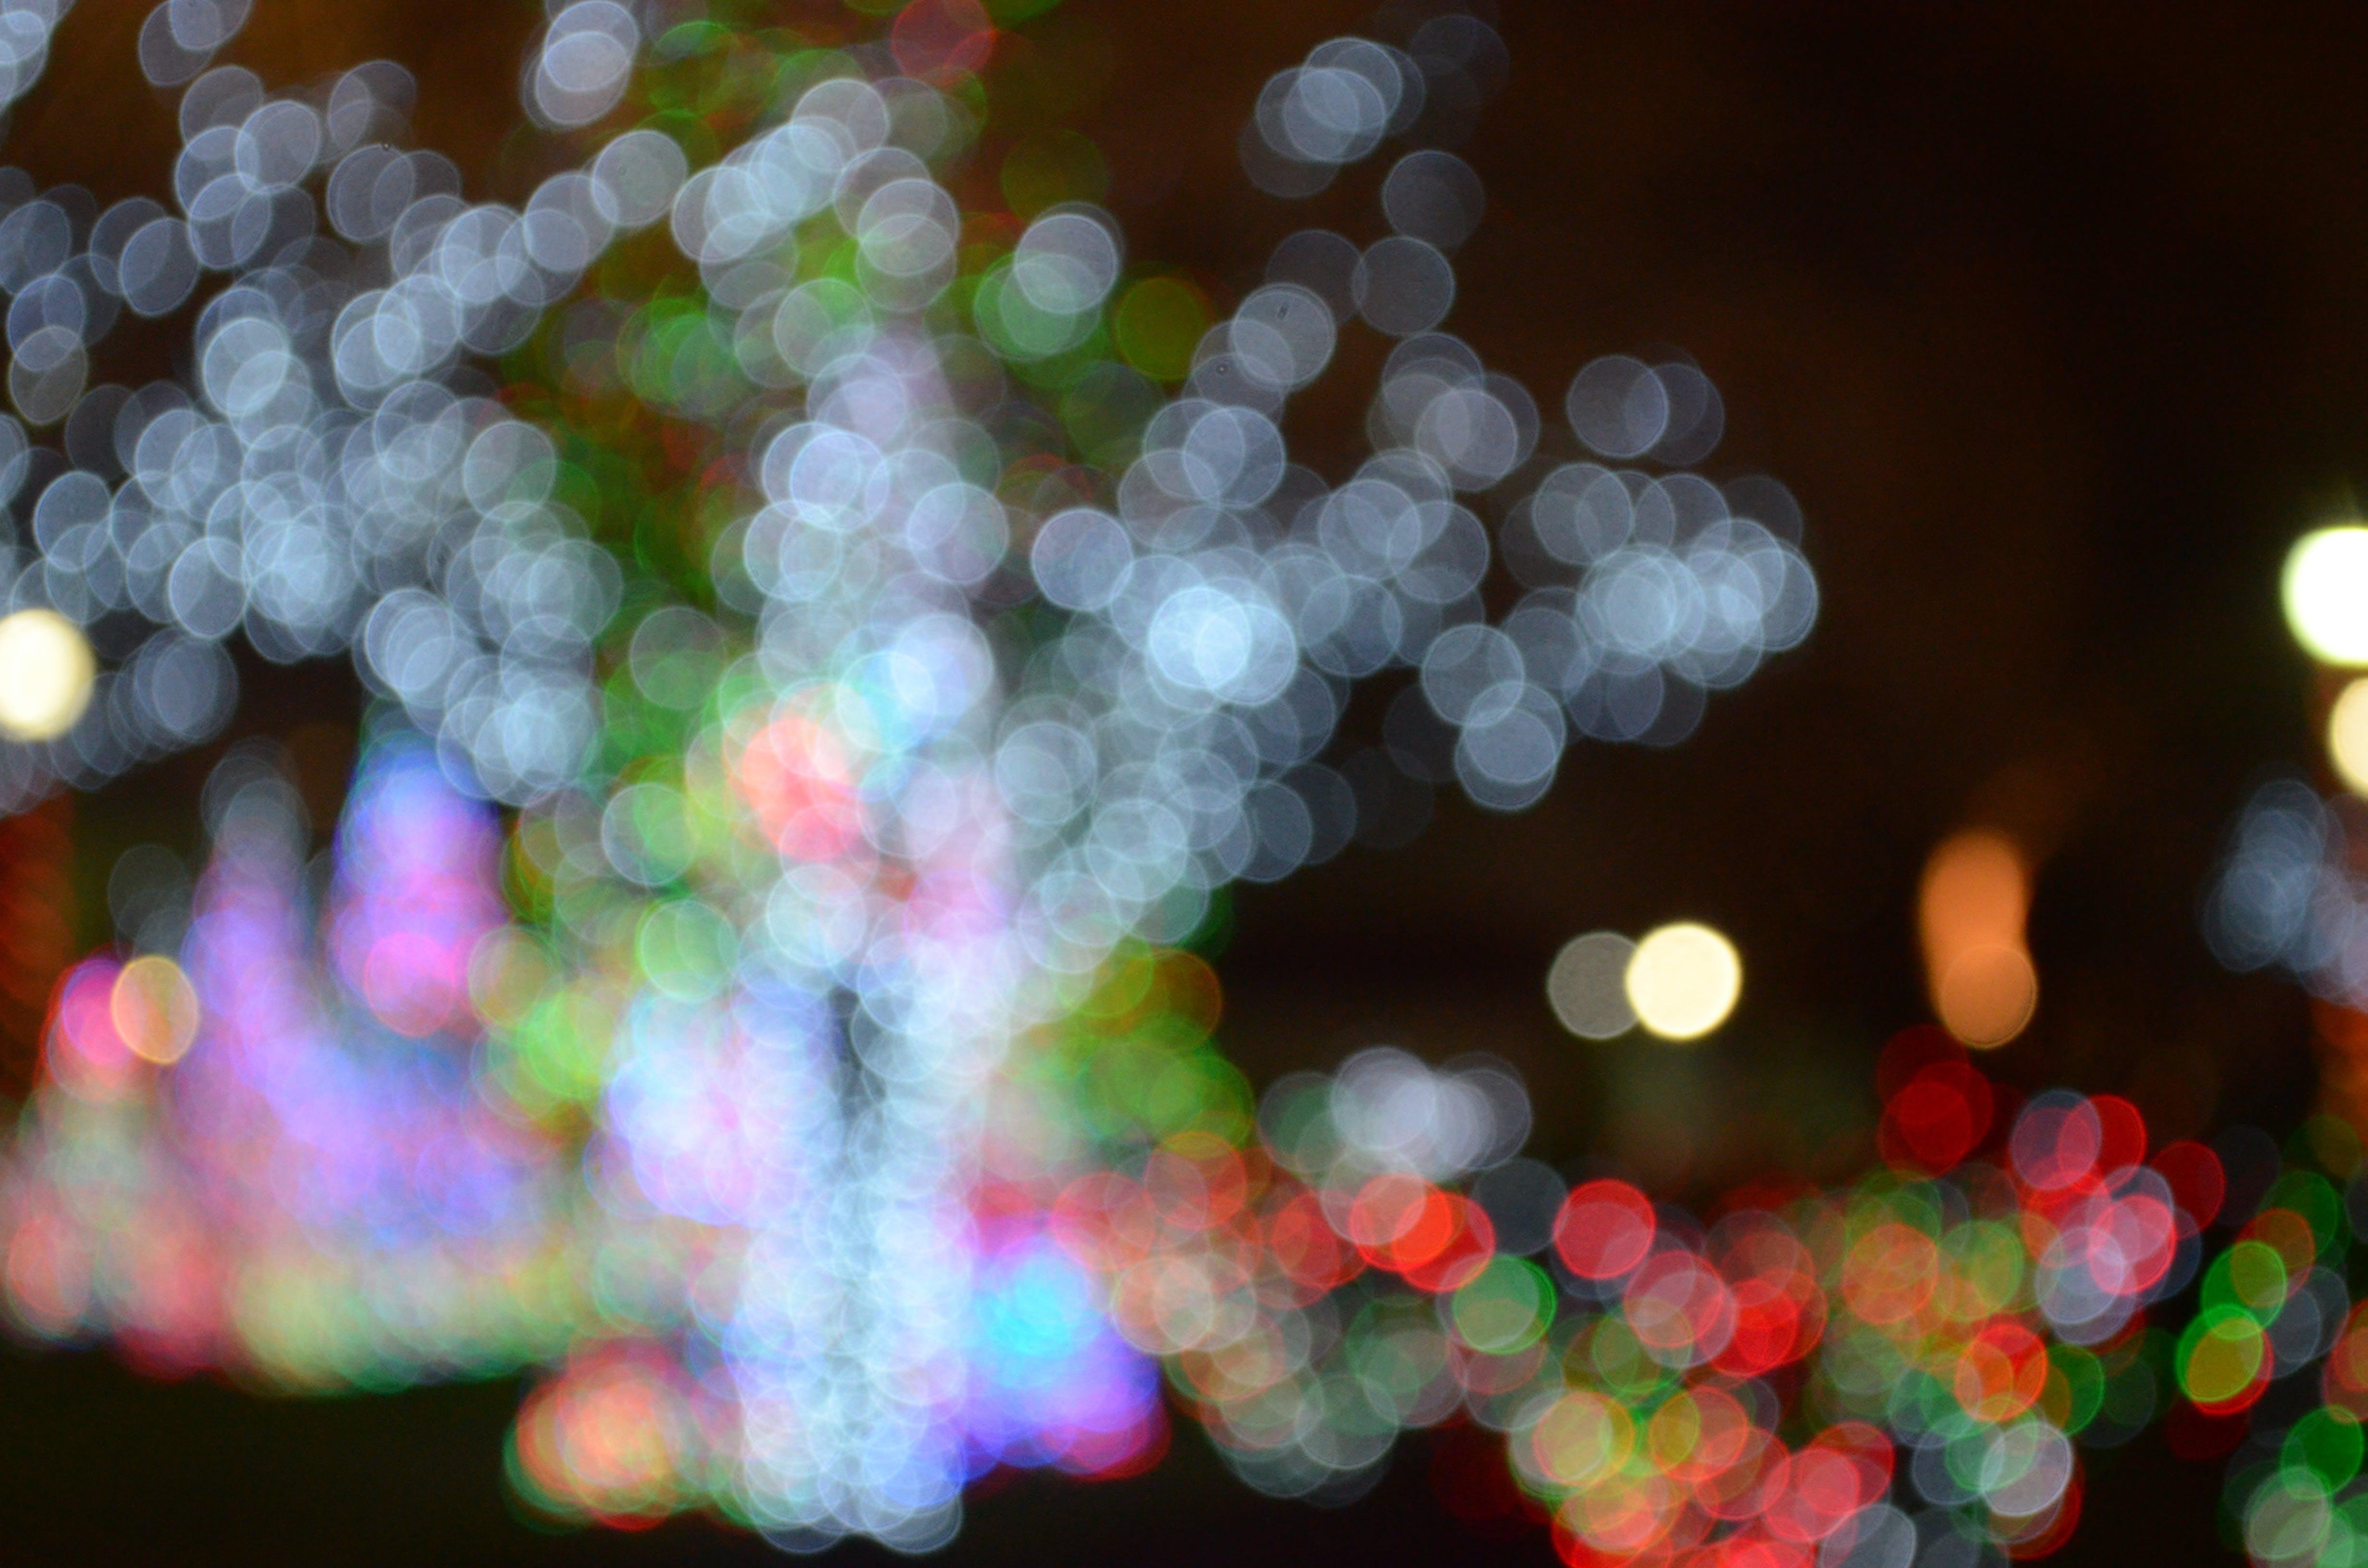 Kostenloses Stock Foto zu beleuchtung, hell, lumineszenz, verschwommen